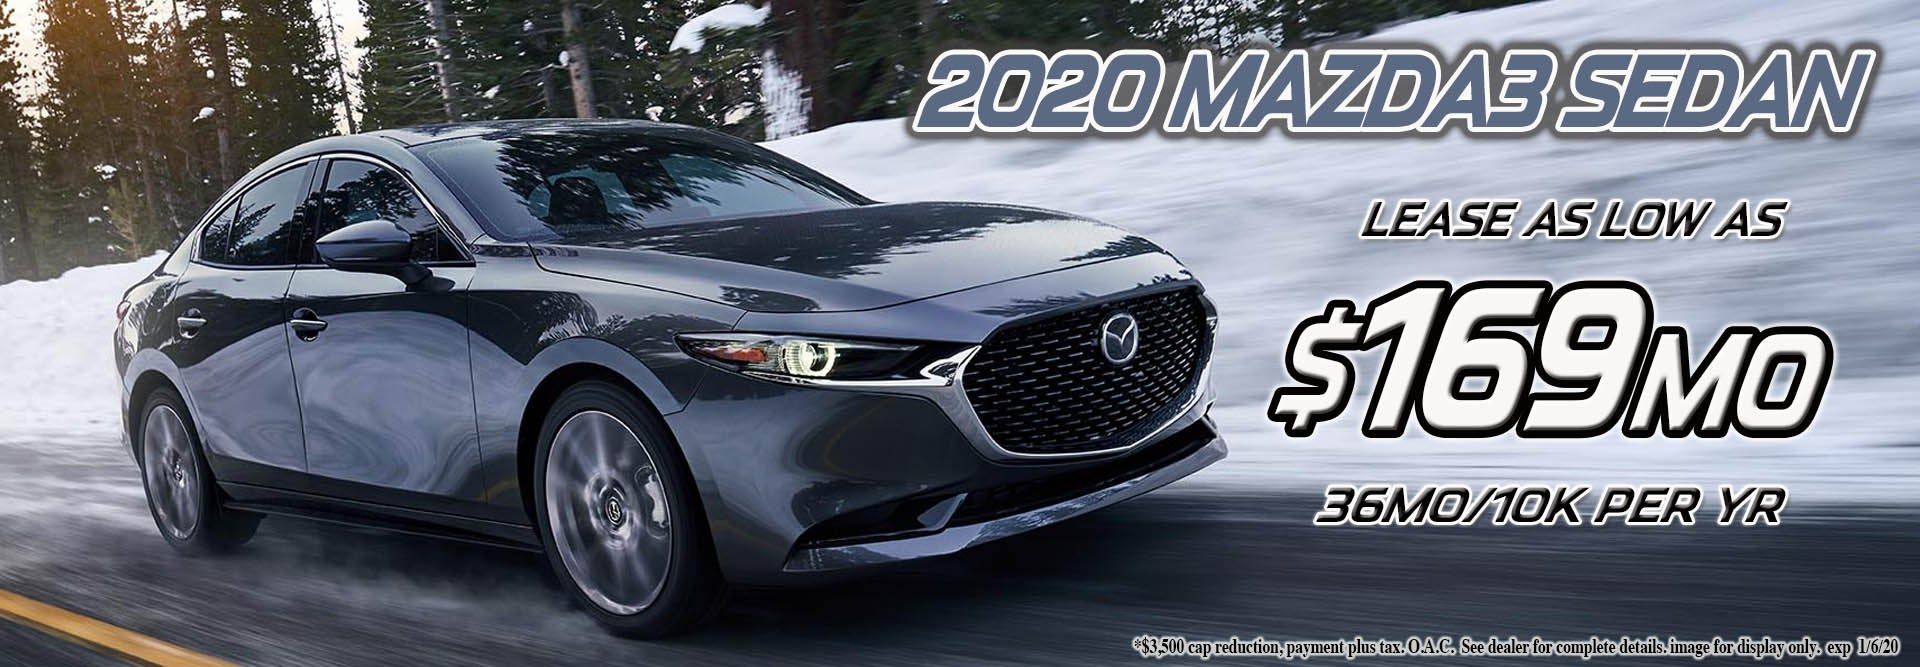 Utah Used Car Sales >> Mazda Dealer In Bountiful Ut Used Cars Bountiful